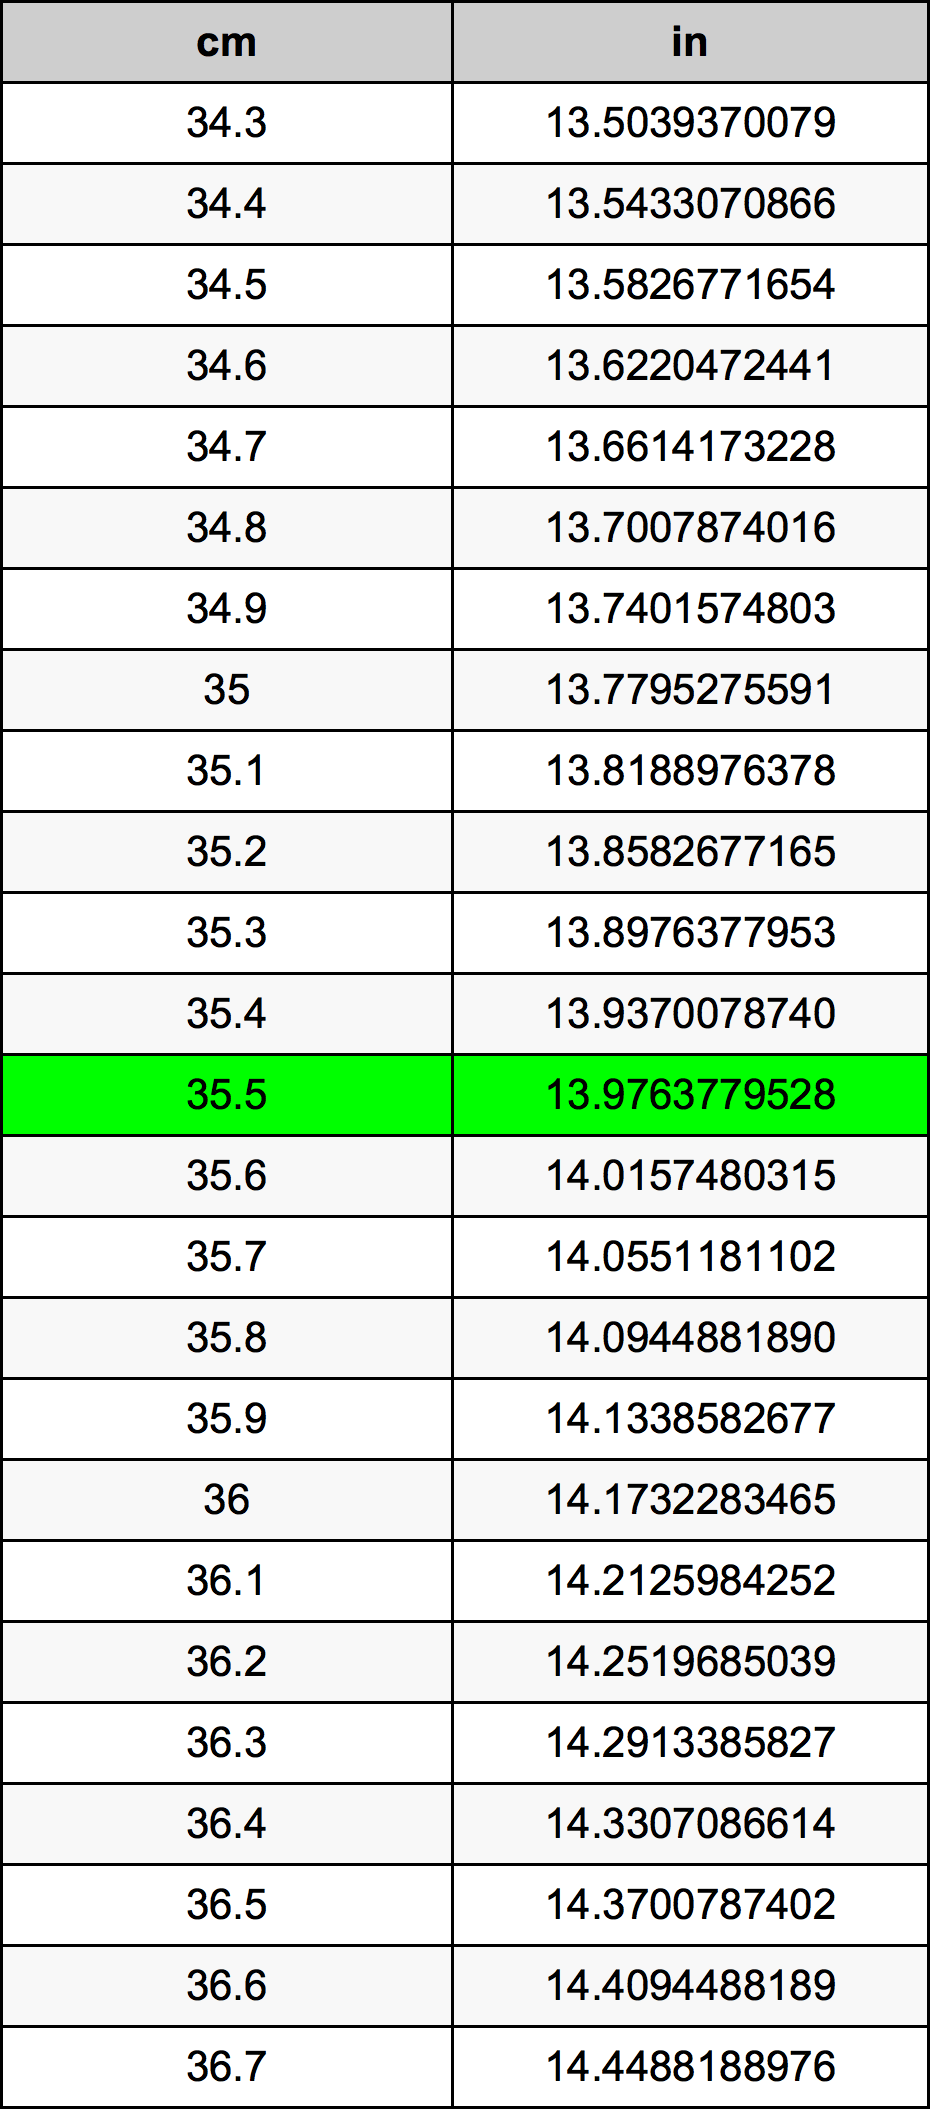 35.5 Centimeter Table